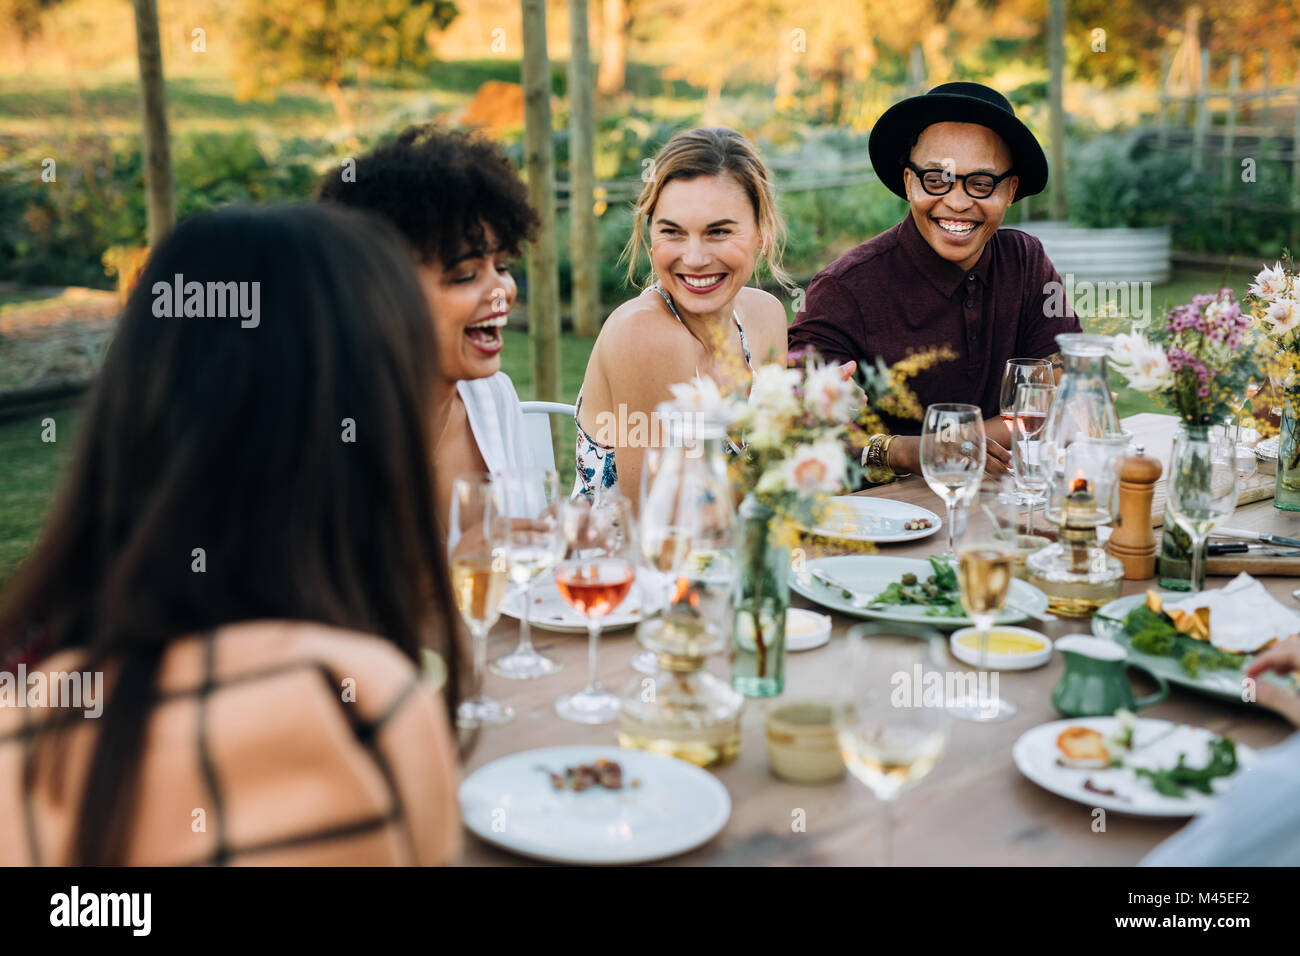 Group of friends enjoying outdoor party in home garden. Millennials  enjoying summer meal at restaurant. - Stock Image